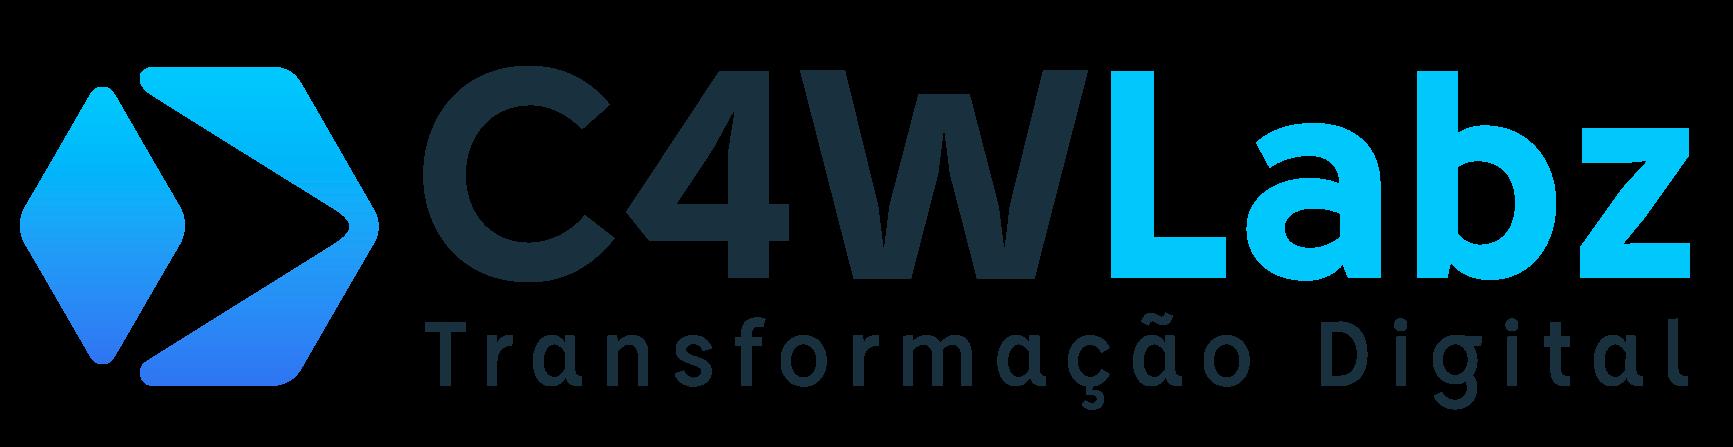 C4W Labz – Transformação Digital